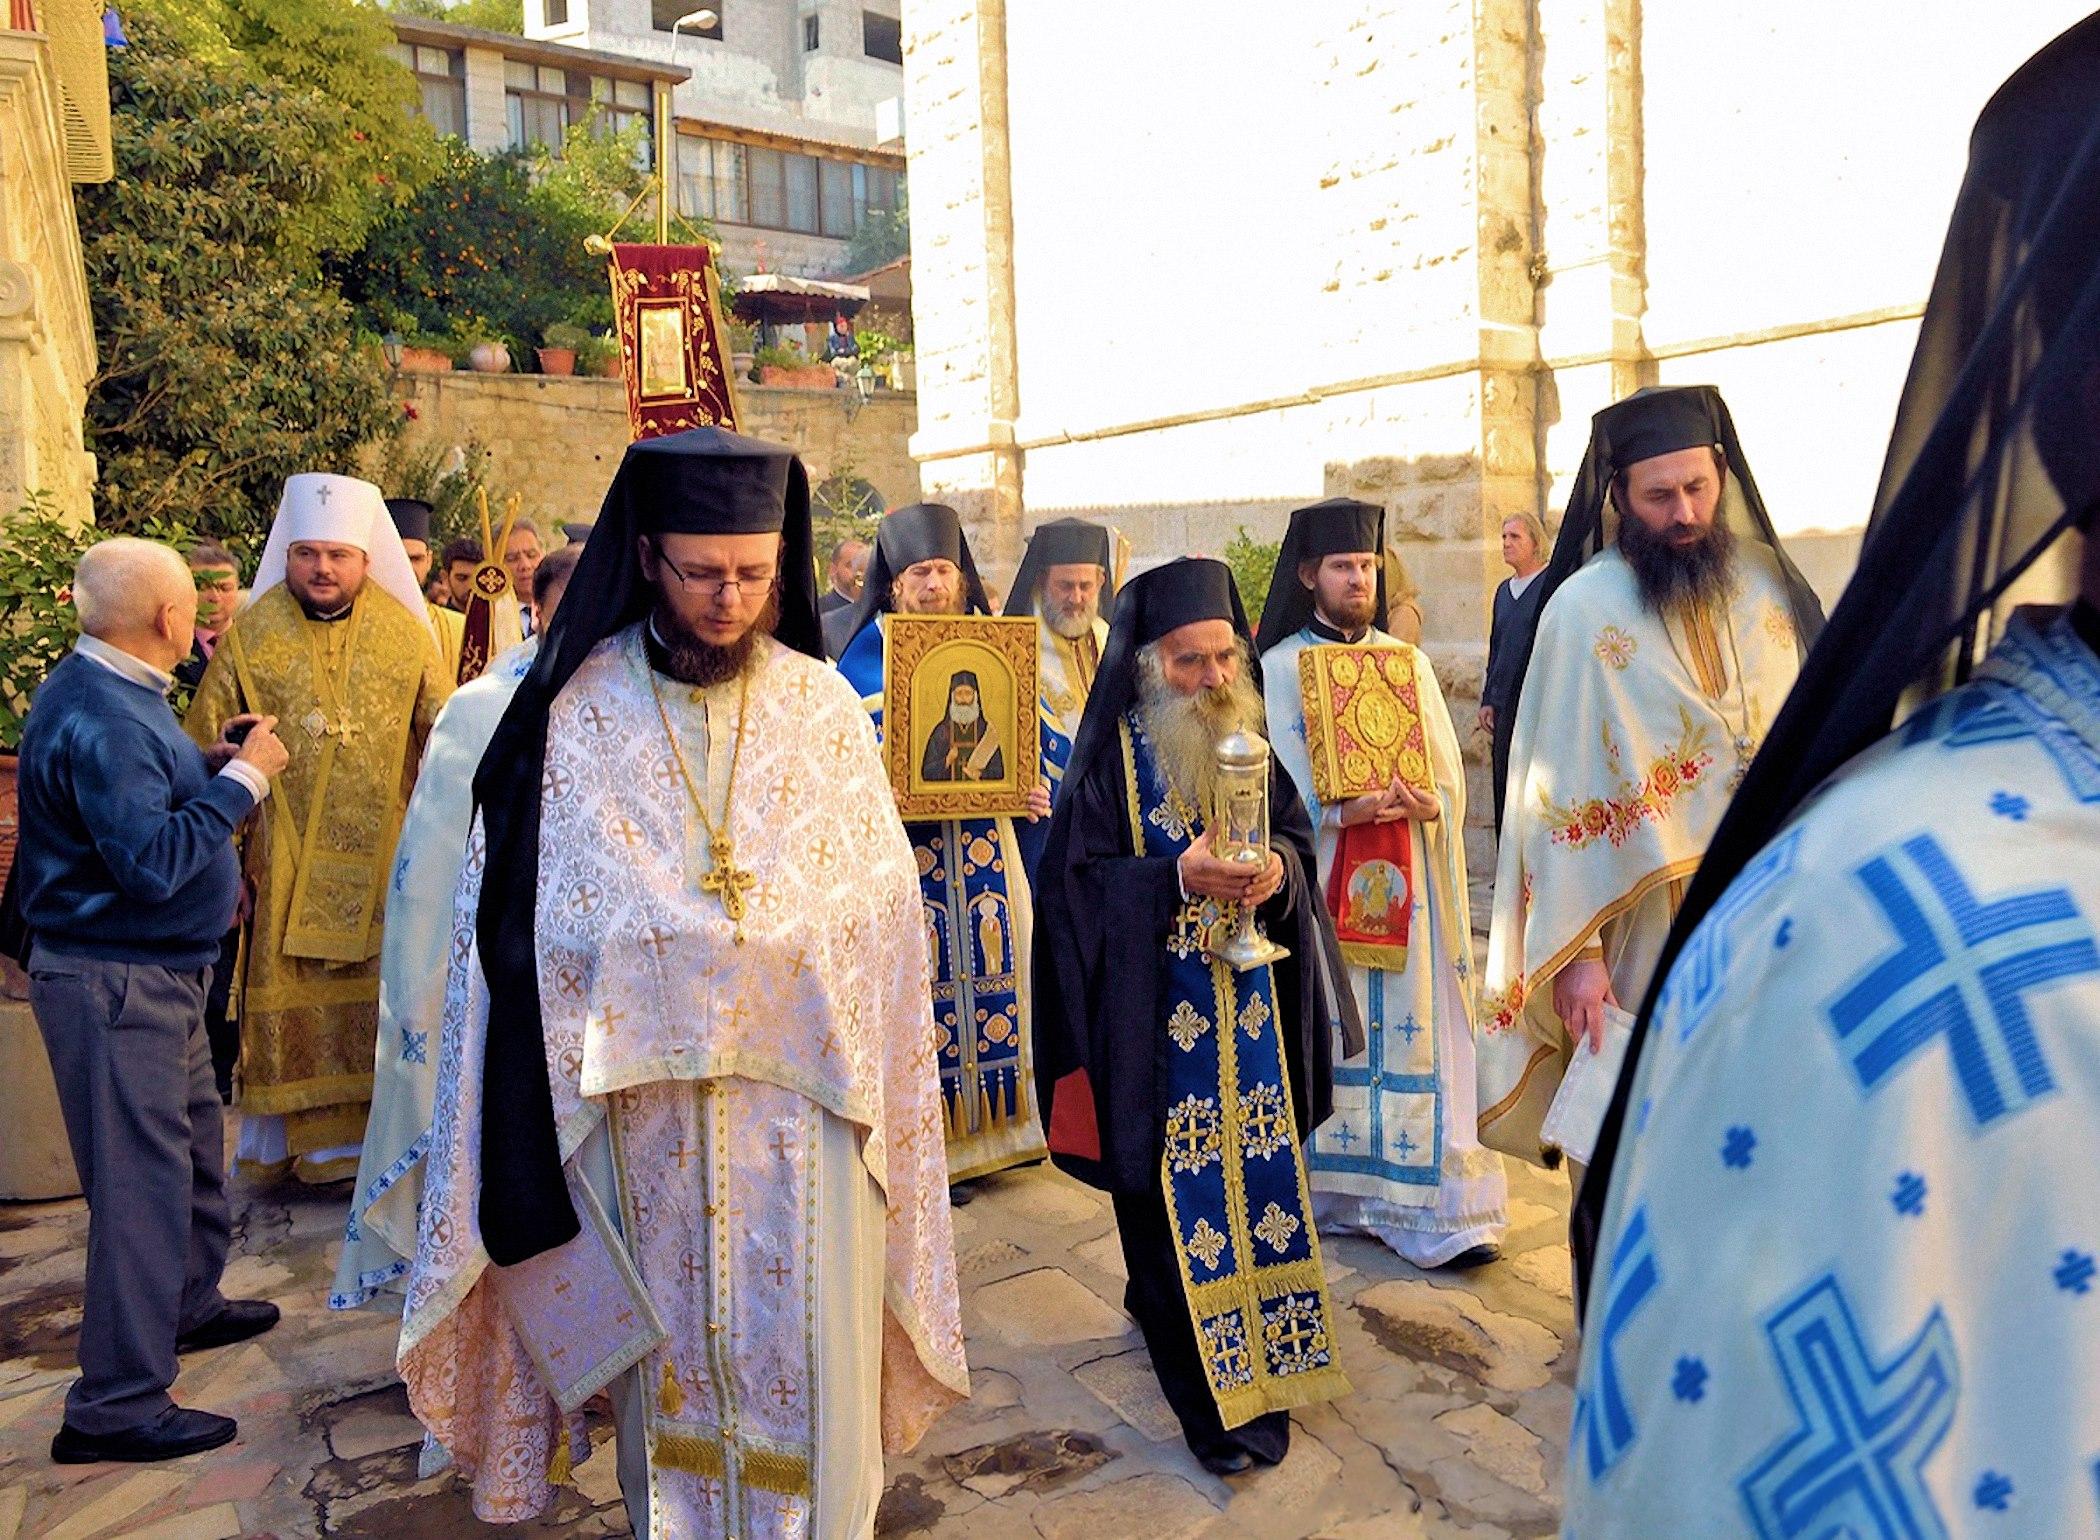 00 ukriane cross procession 150716